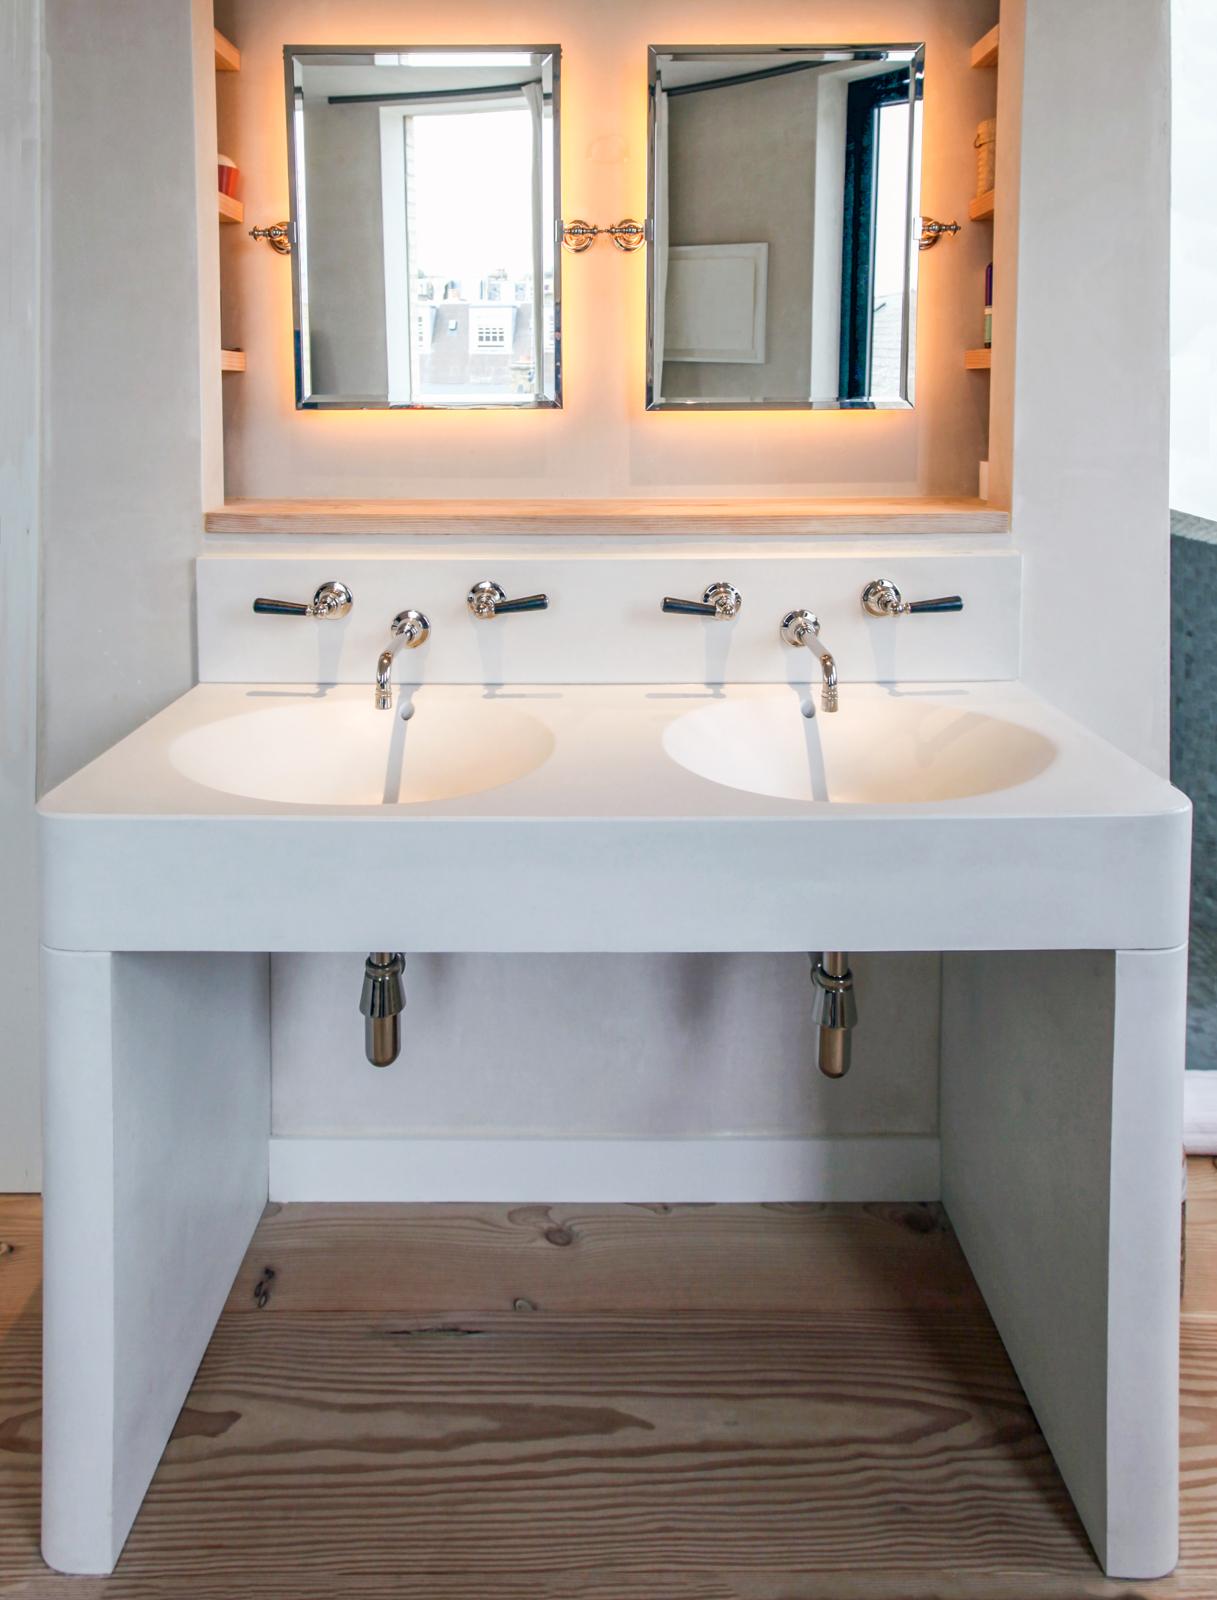 Twin-white-stone-marble-basin-sink.jpg